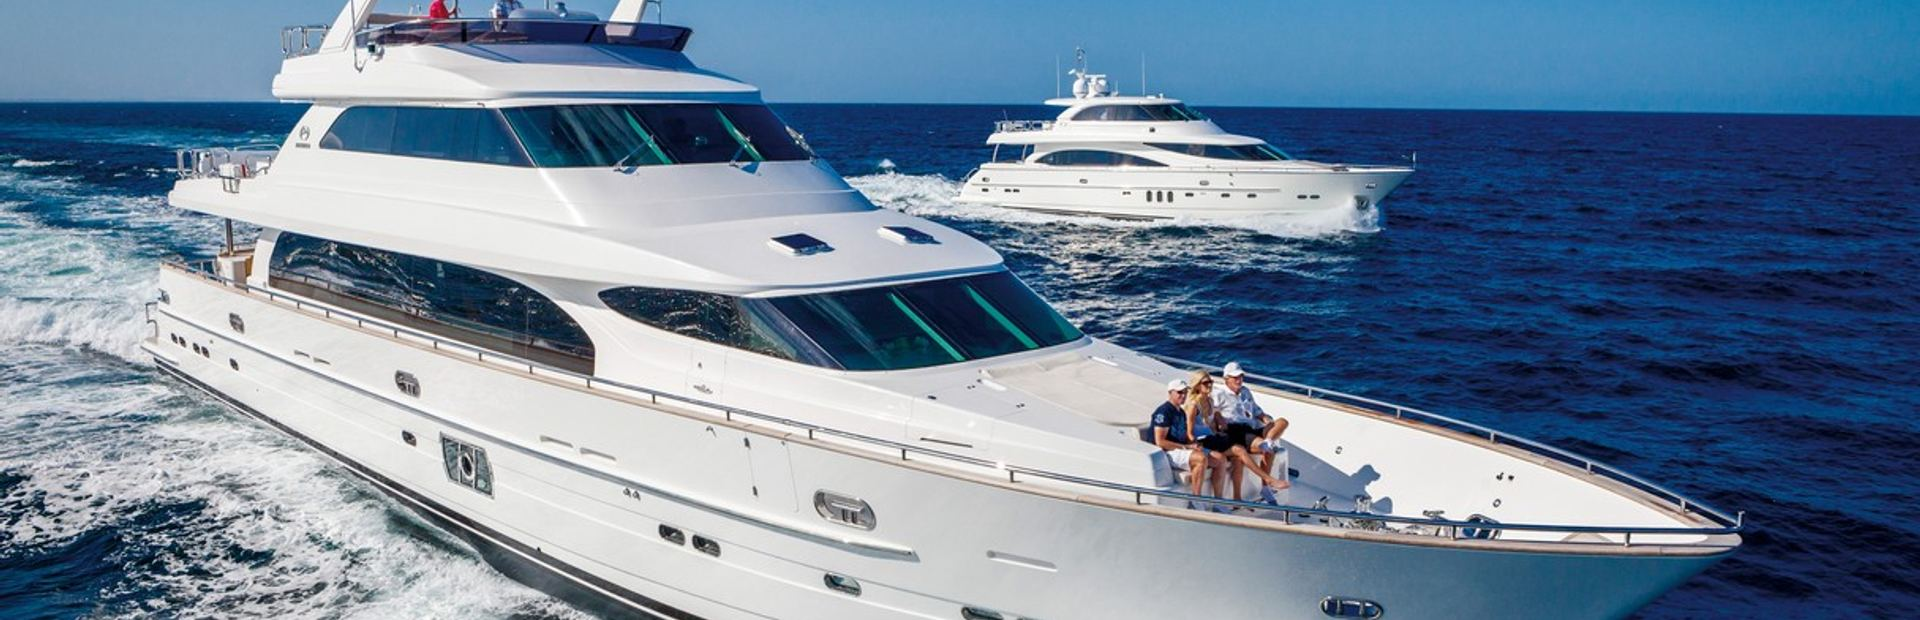 P110 Yacht Charter